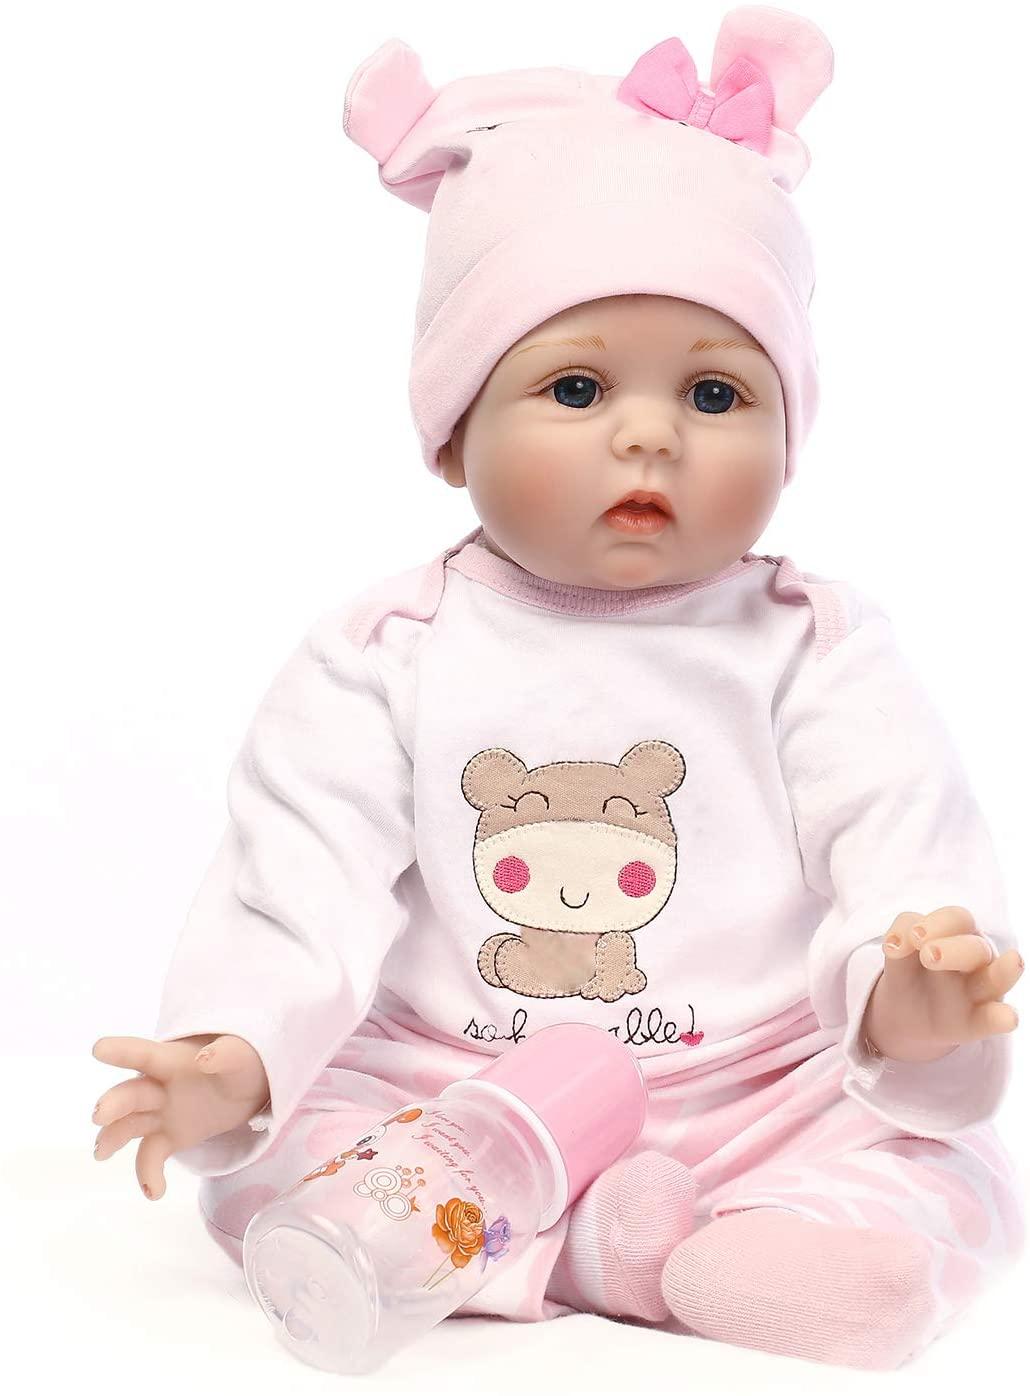 Reborn Baby Dolls 22 inch,Quality Realistic Handmade Babies Dolls Girls Soft Vinyl Silicone Lifelike Kids Gifts / Toys Age 3+, EN71 Certification